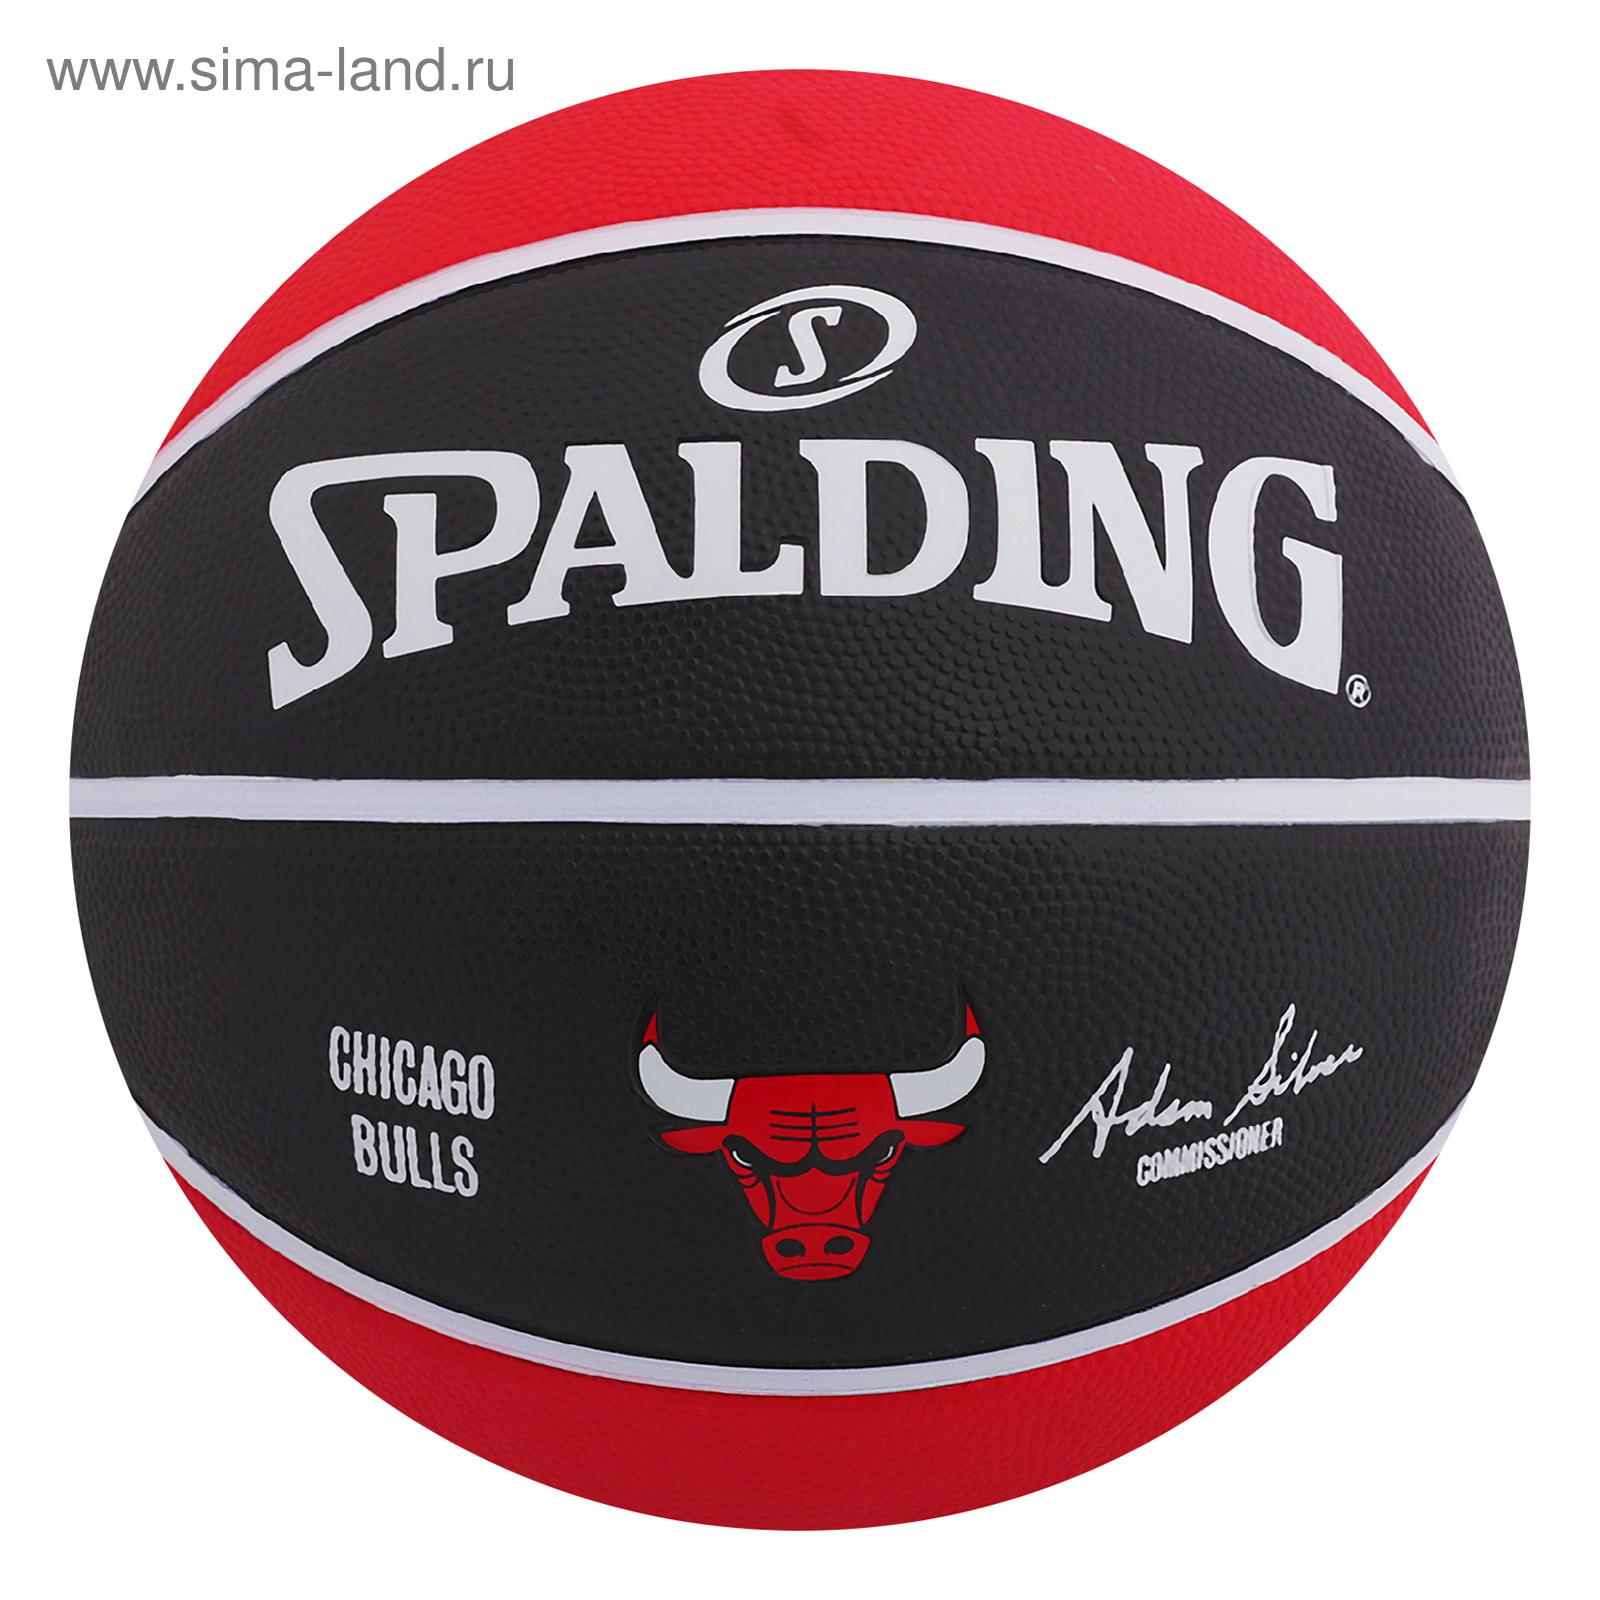 55f7577e Мяч баскетбольный Spalding Chicago Bulls, 83-173z, размер 7 (717366 ...